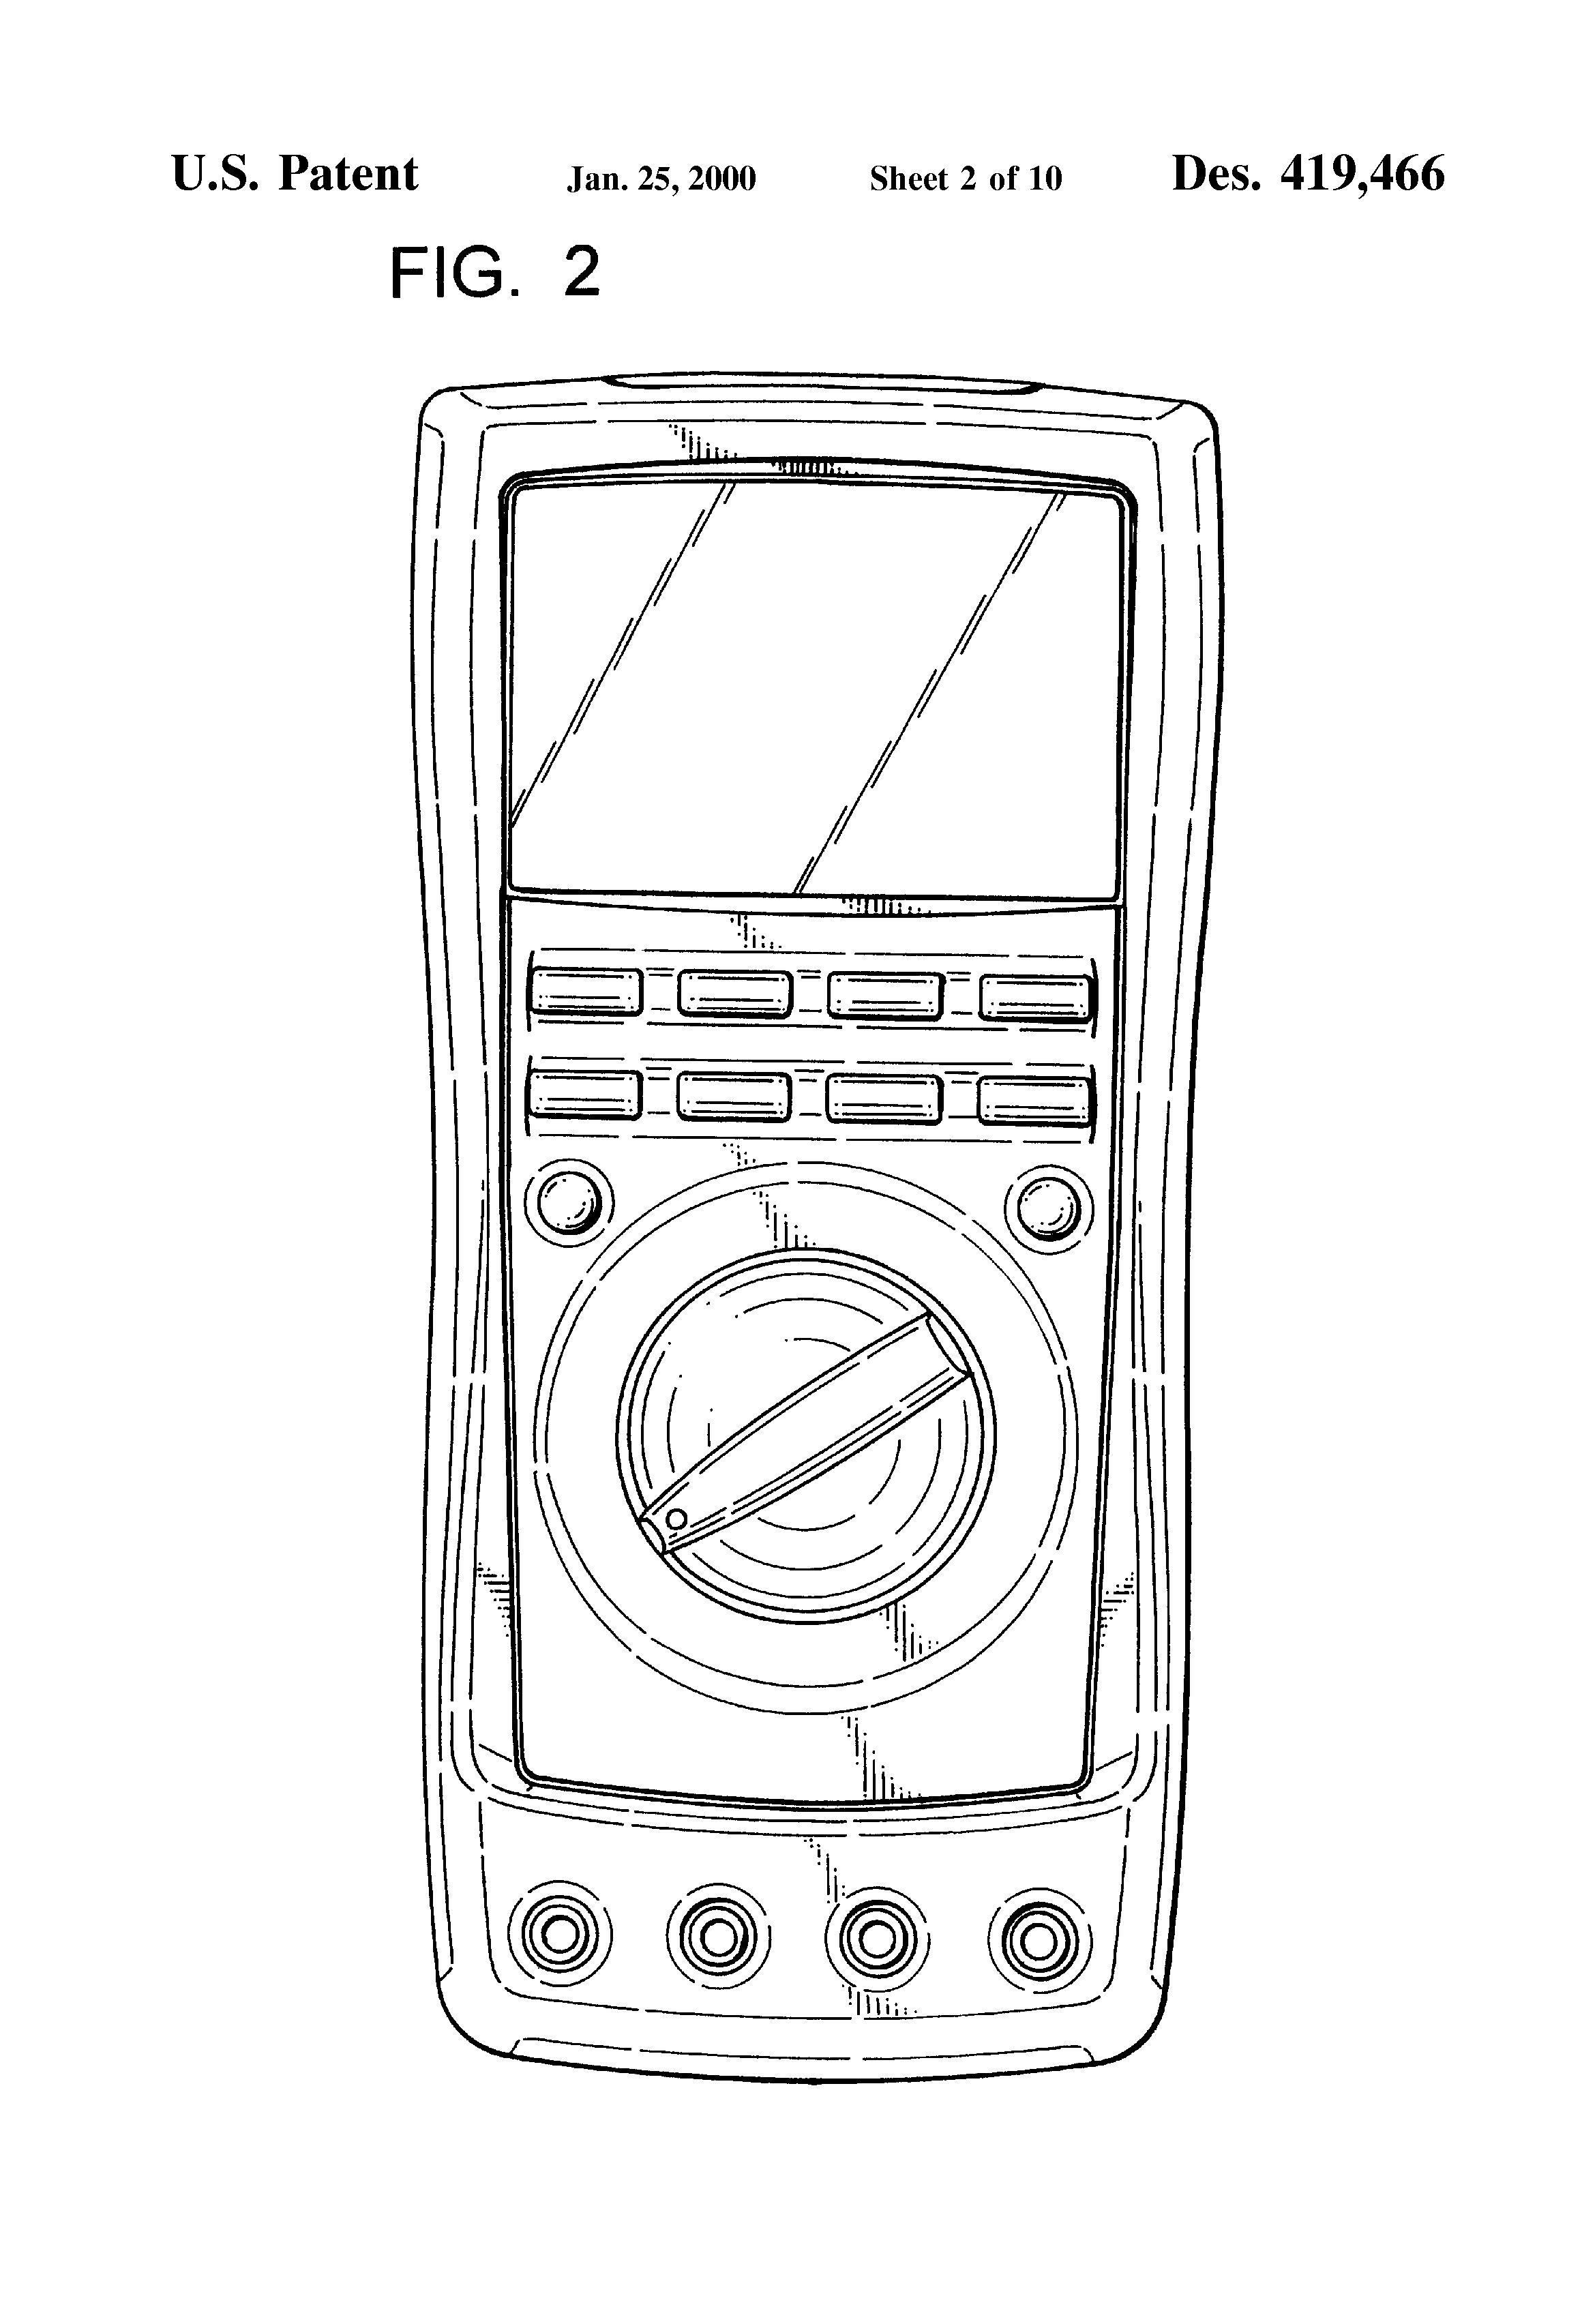 patent usd419466 - digital multimeter